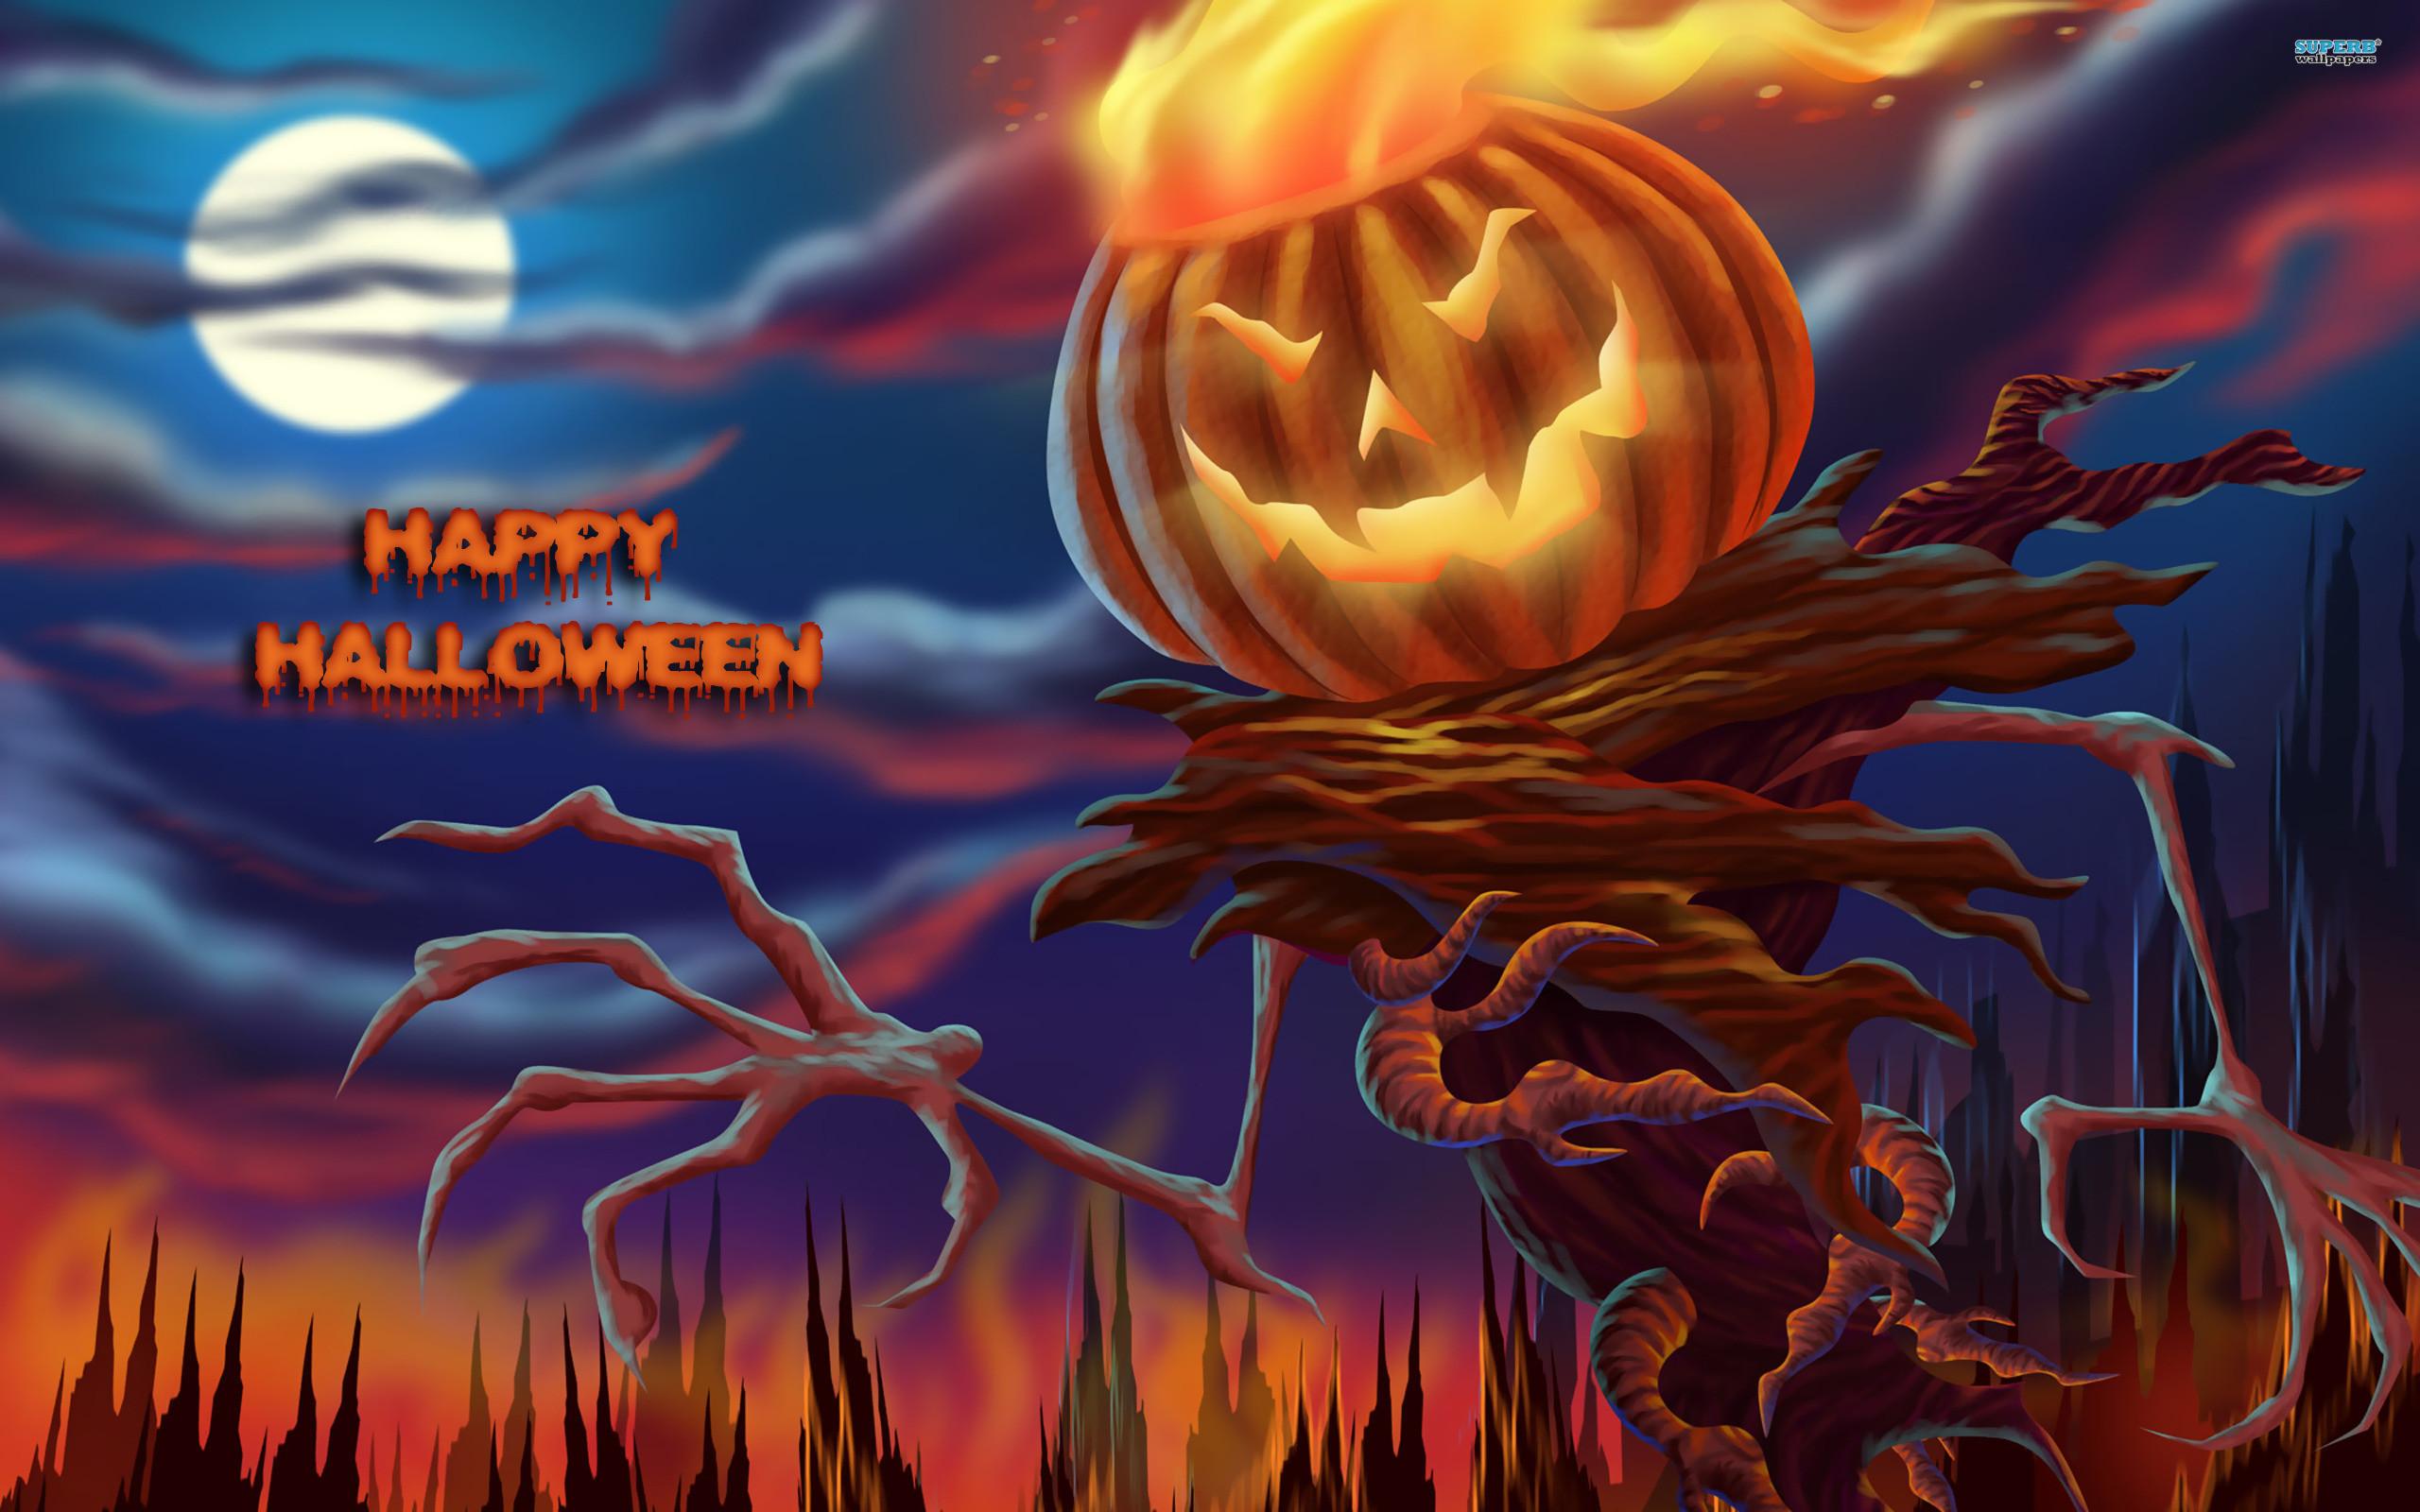 scary-happy-halloween-wallpaper-hd